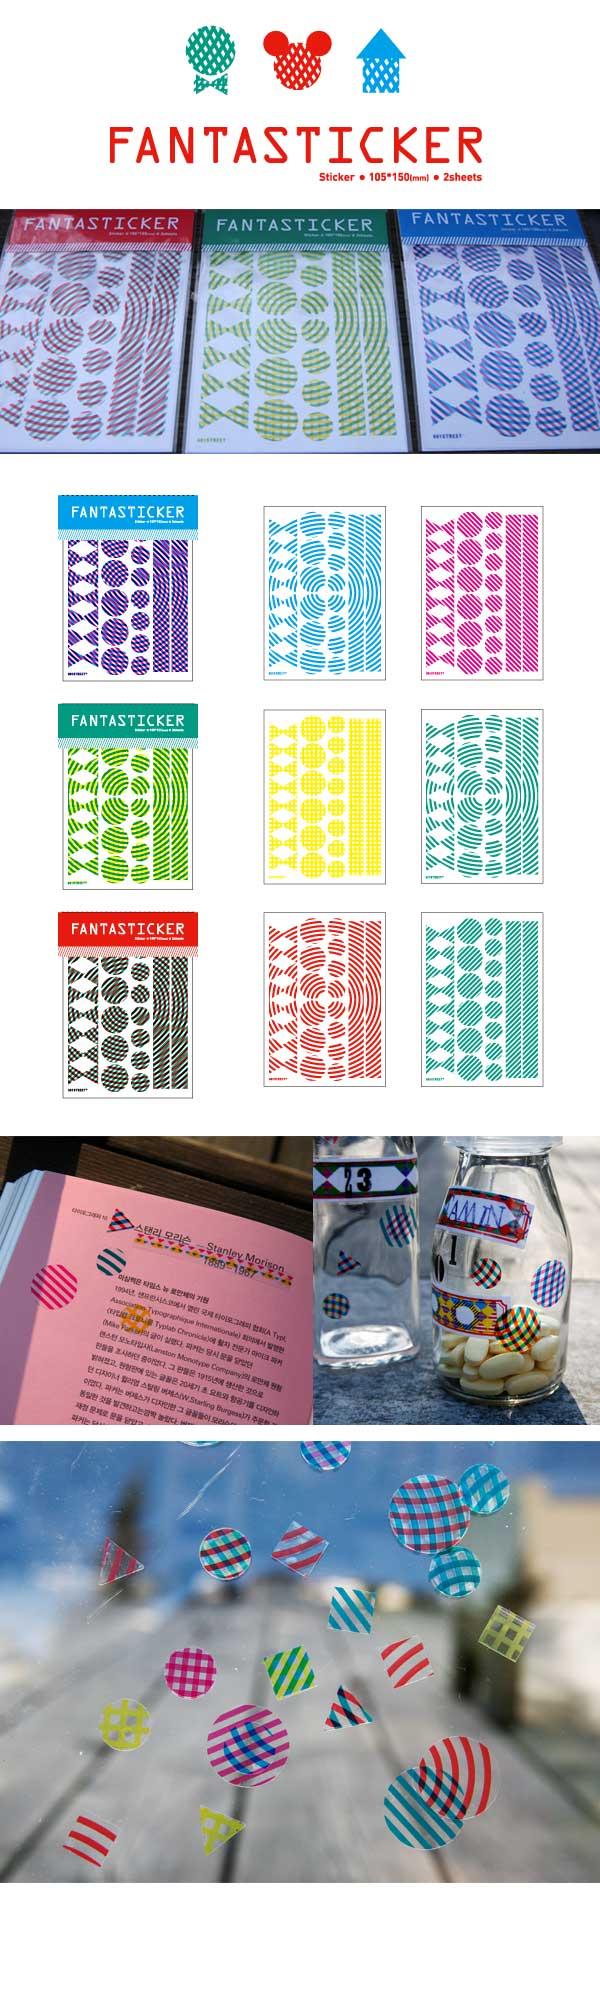 fantasticker - C - SeoulPicks.com